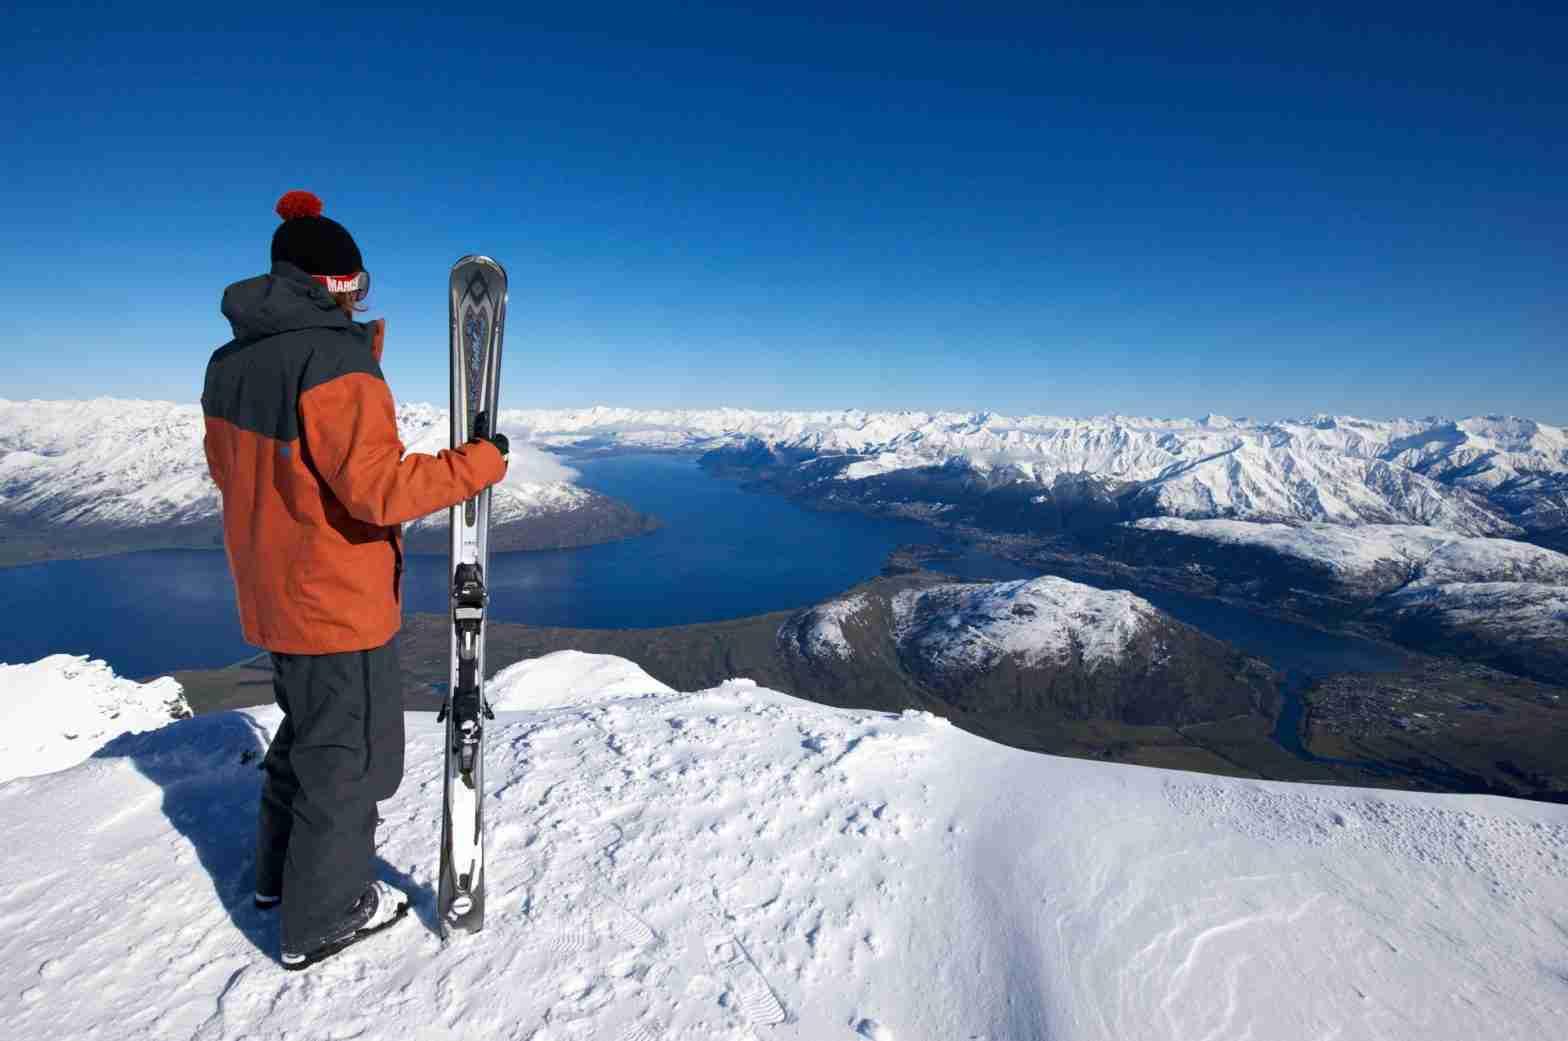 The Remarkables Ski Field, Queenstown, New Zealand.